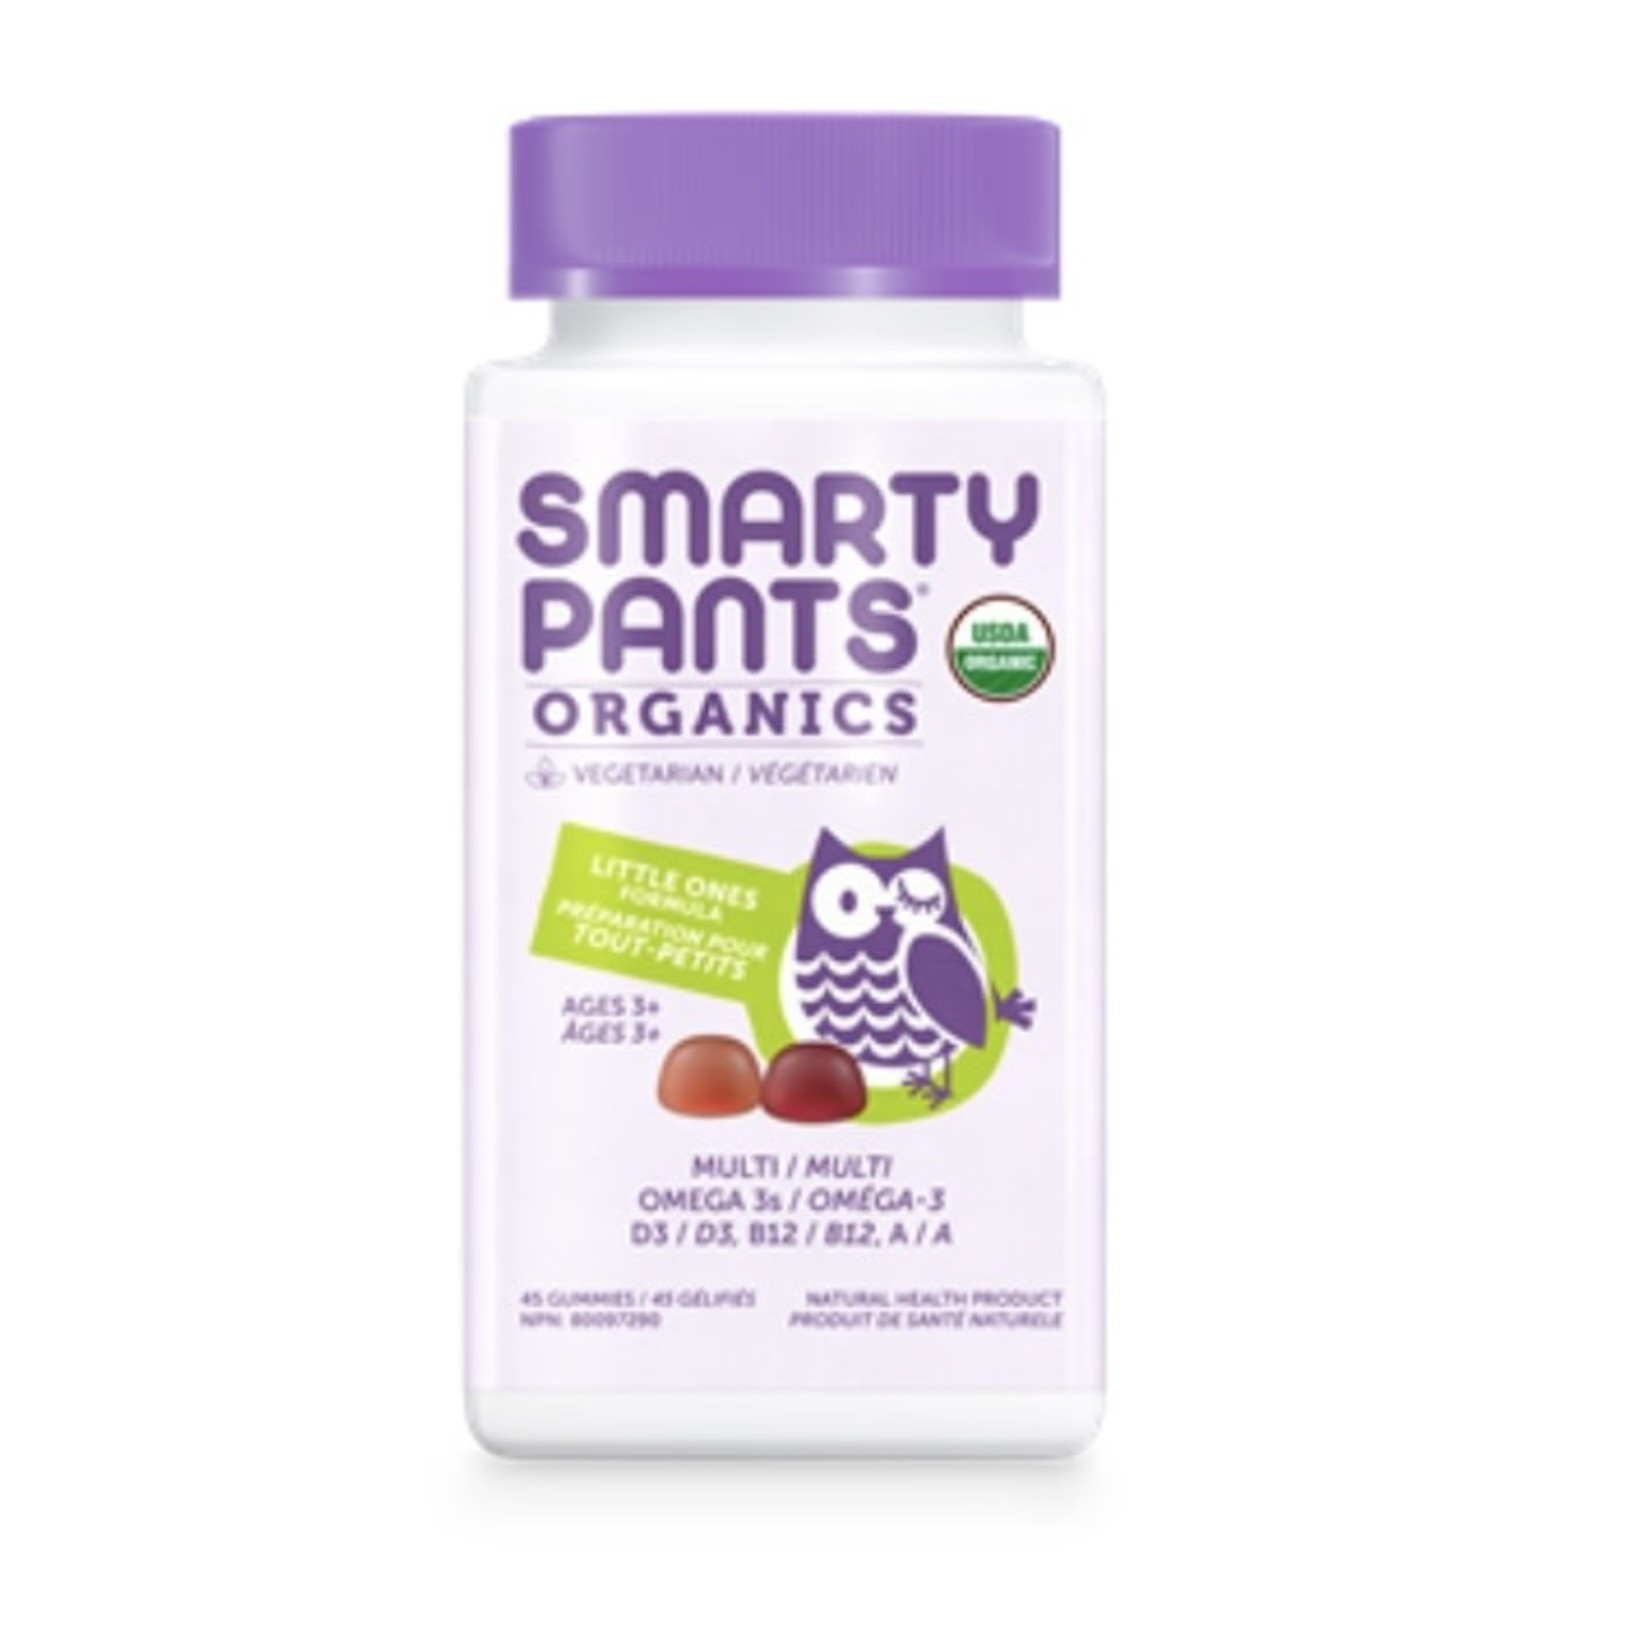 Smarty Pants Smarty Pants Organics Little Ones Formula 45 gummies